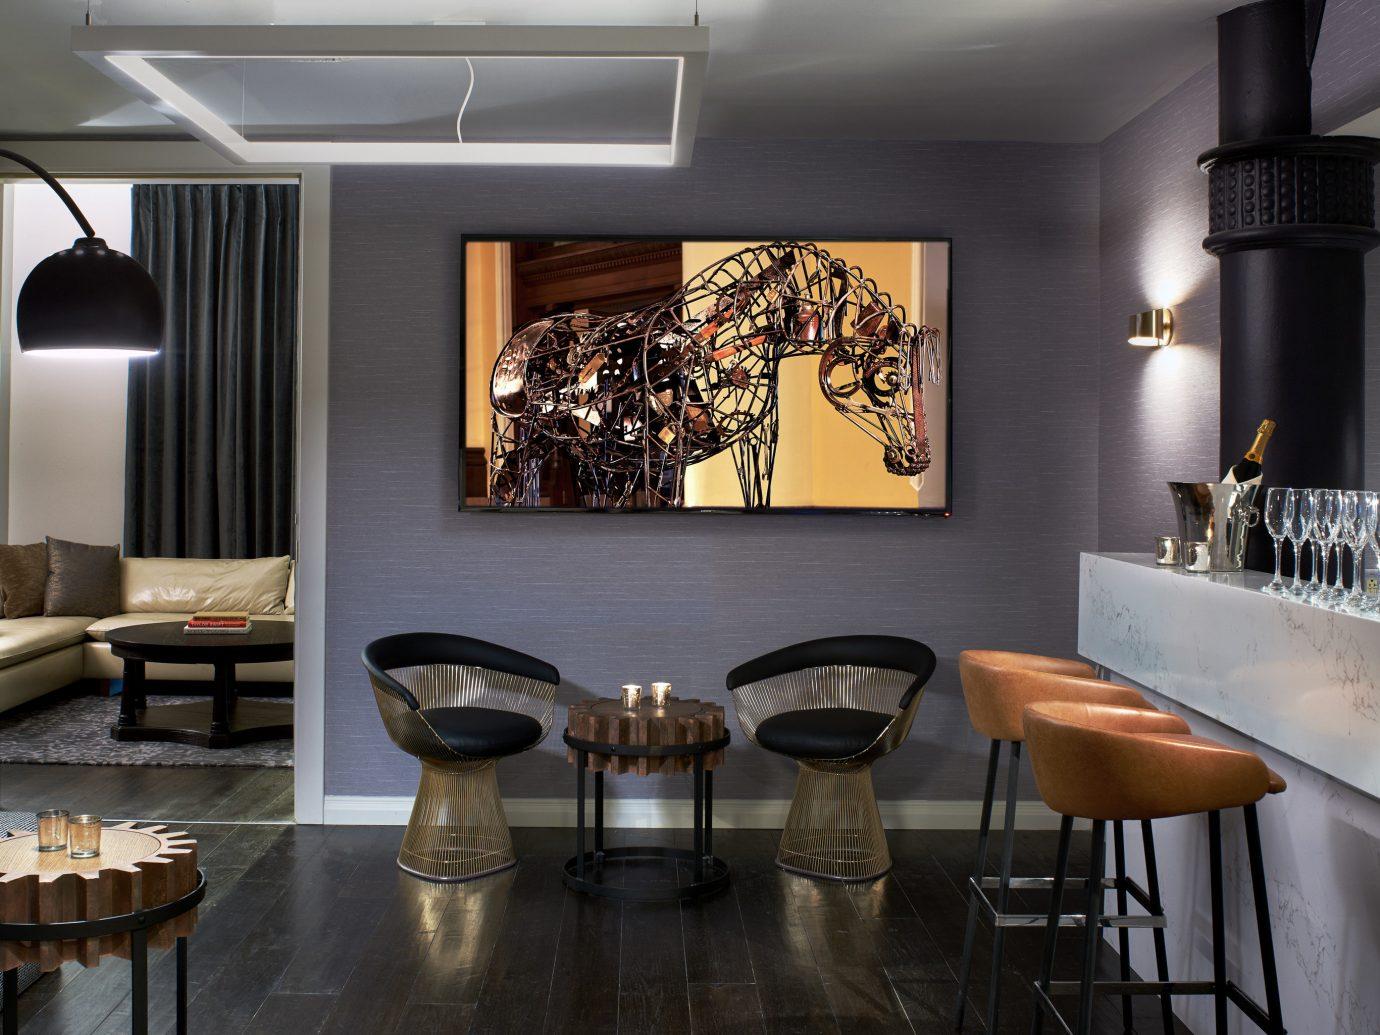 Boutique Hotels Trip Ideas indoor wall dining room floor room property ceiling interior design living room restaurant home lighting Design Kitchen furniture area